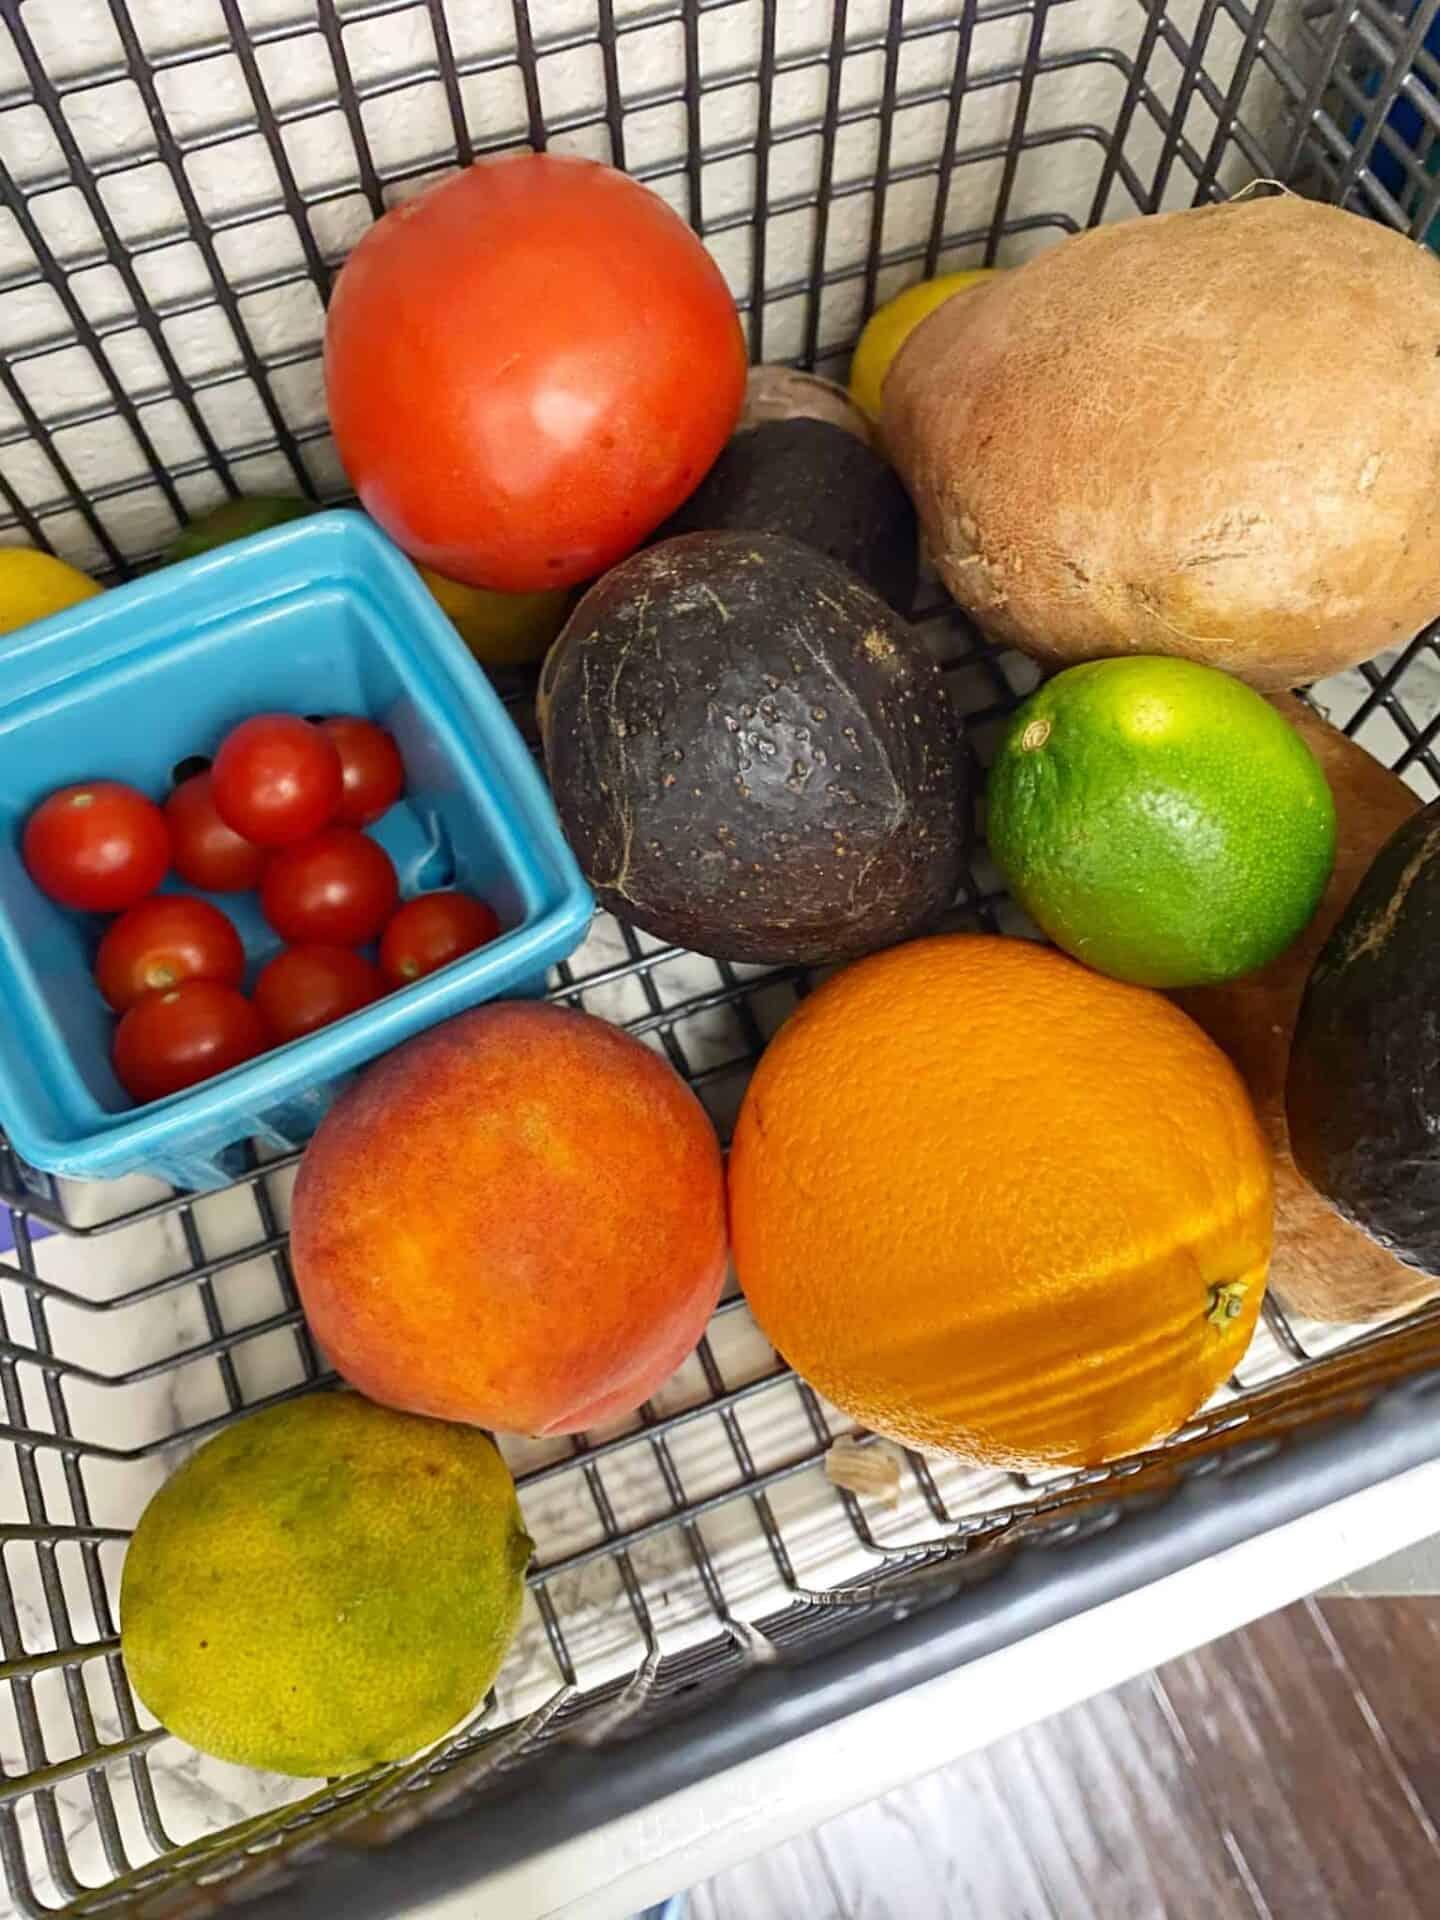 Pantry-Staples-citrus-avocado-tomato